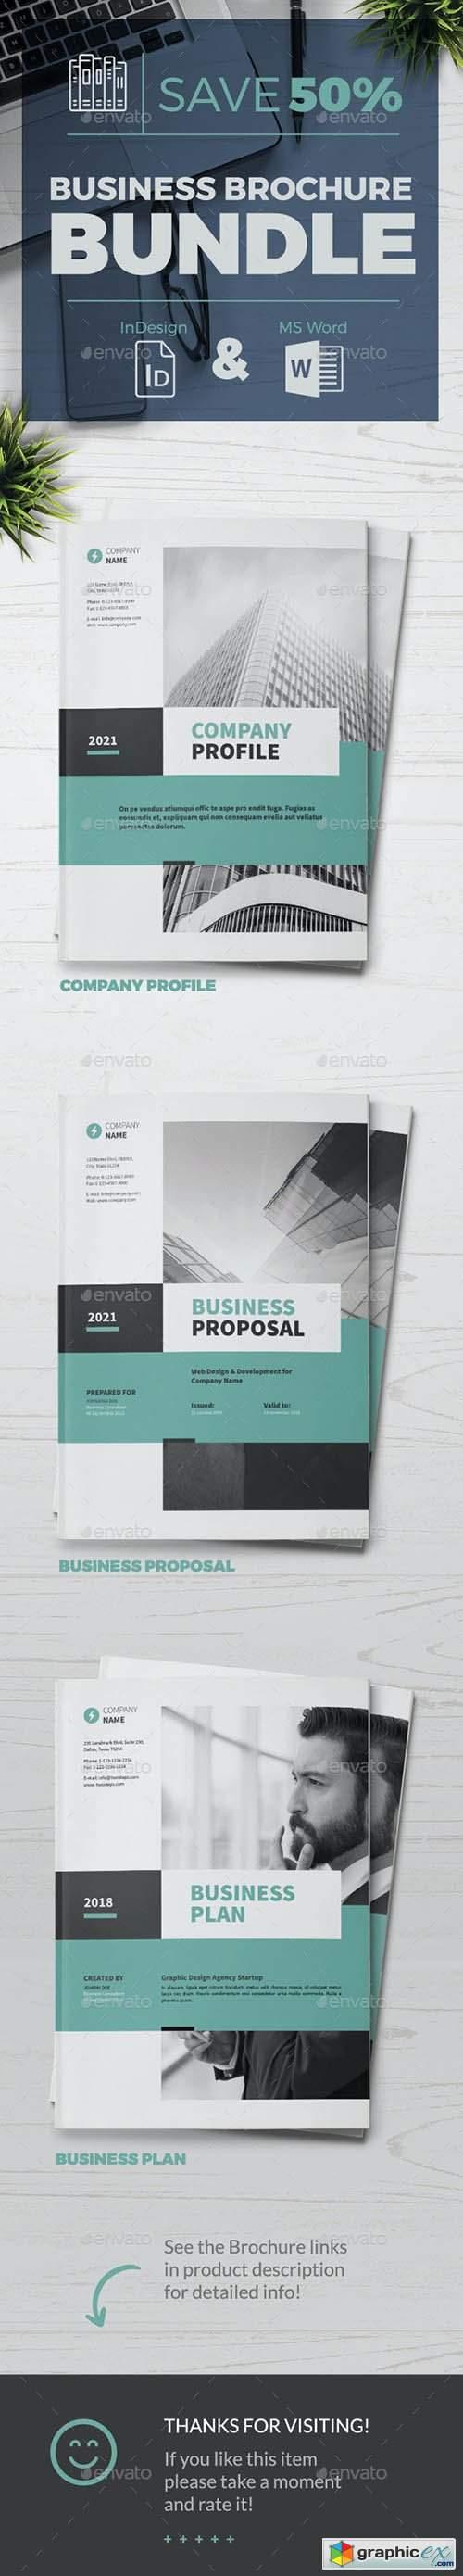 Business Brochures Bundle 28941627